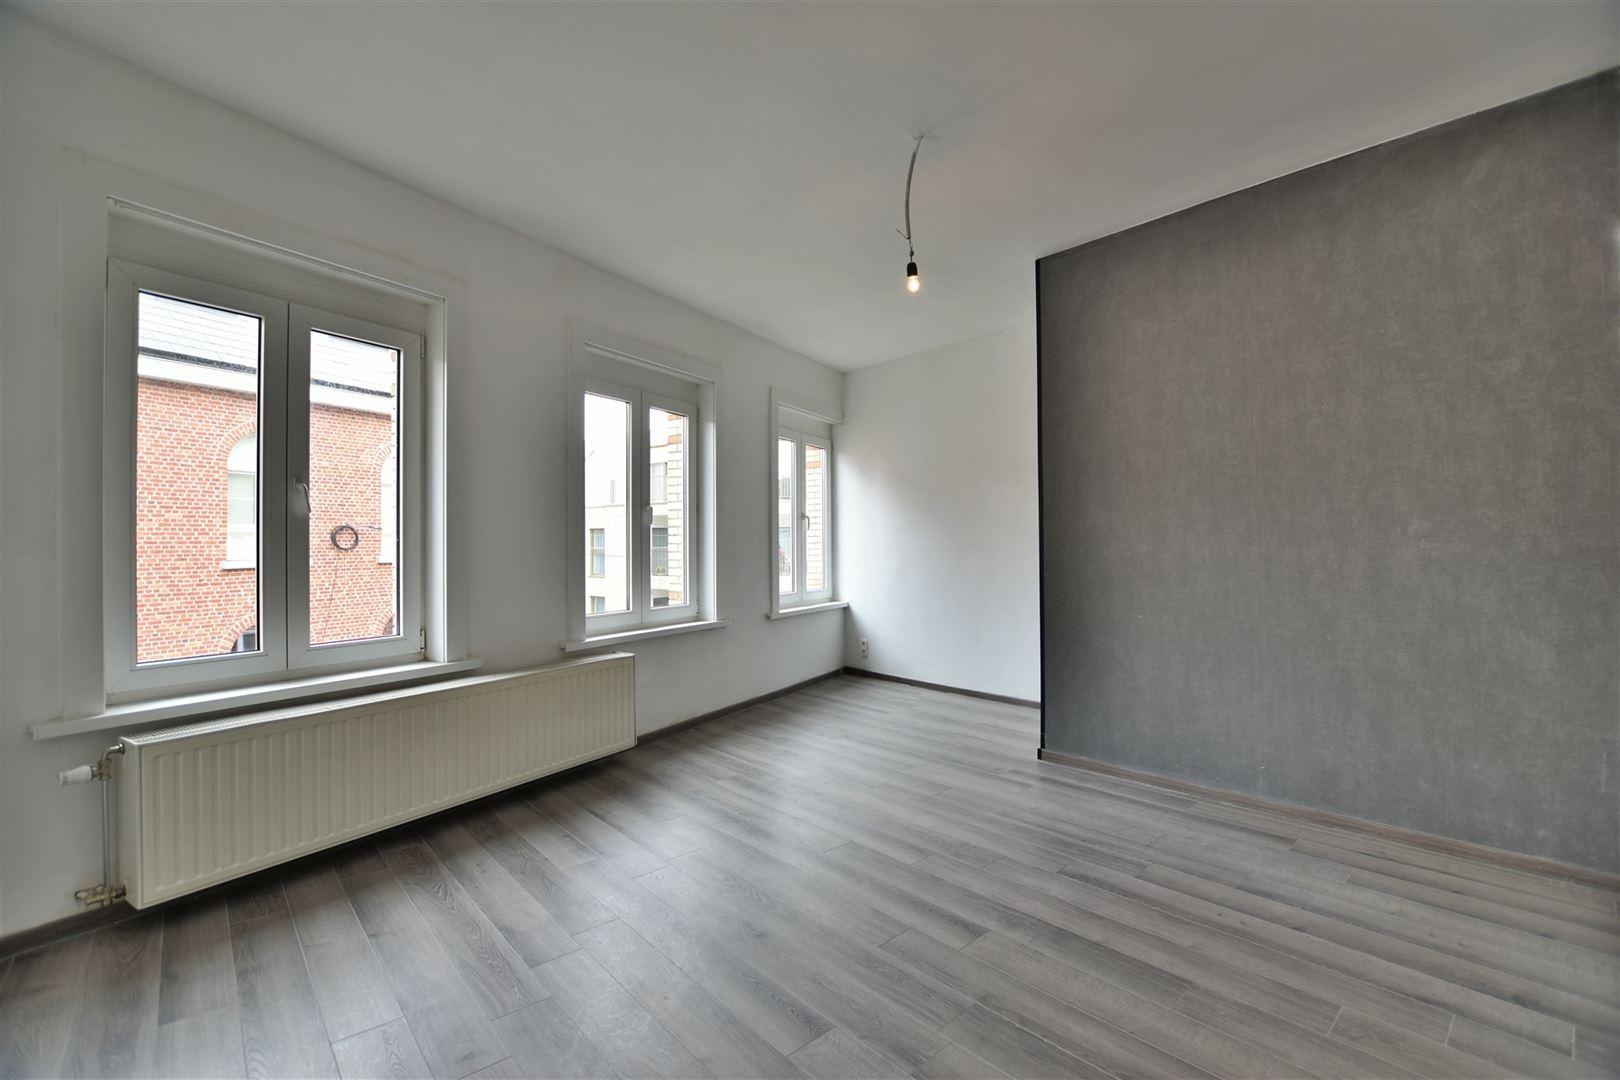 Foto 11 : Appartement te 9200 DENDERMONDE (België) - Prijs € 299.000